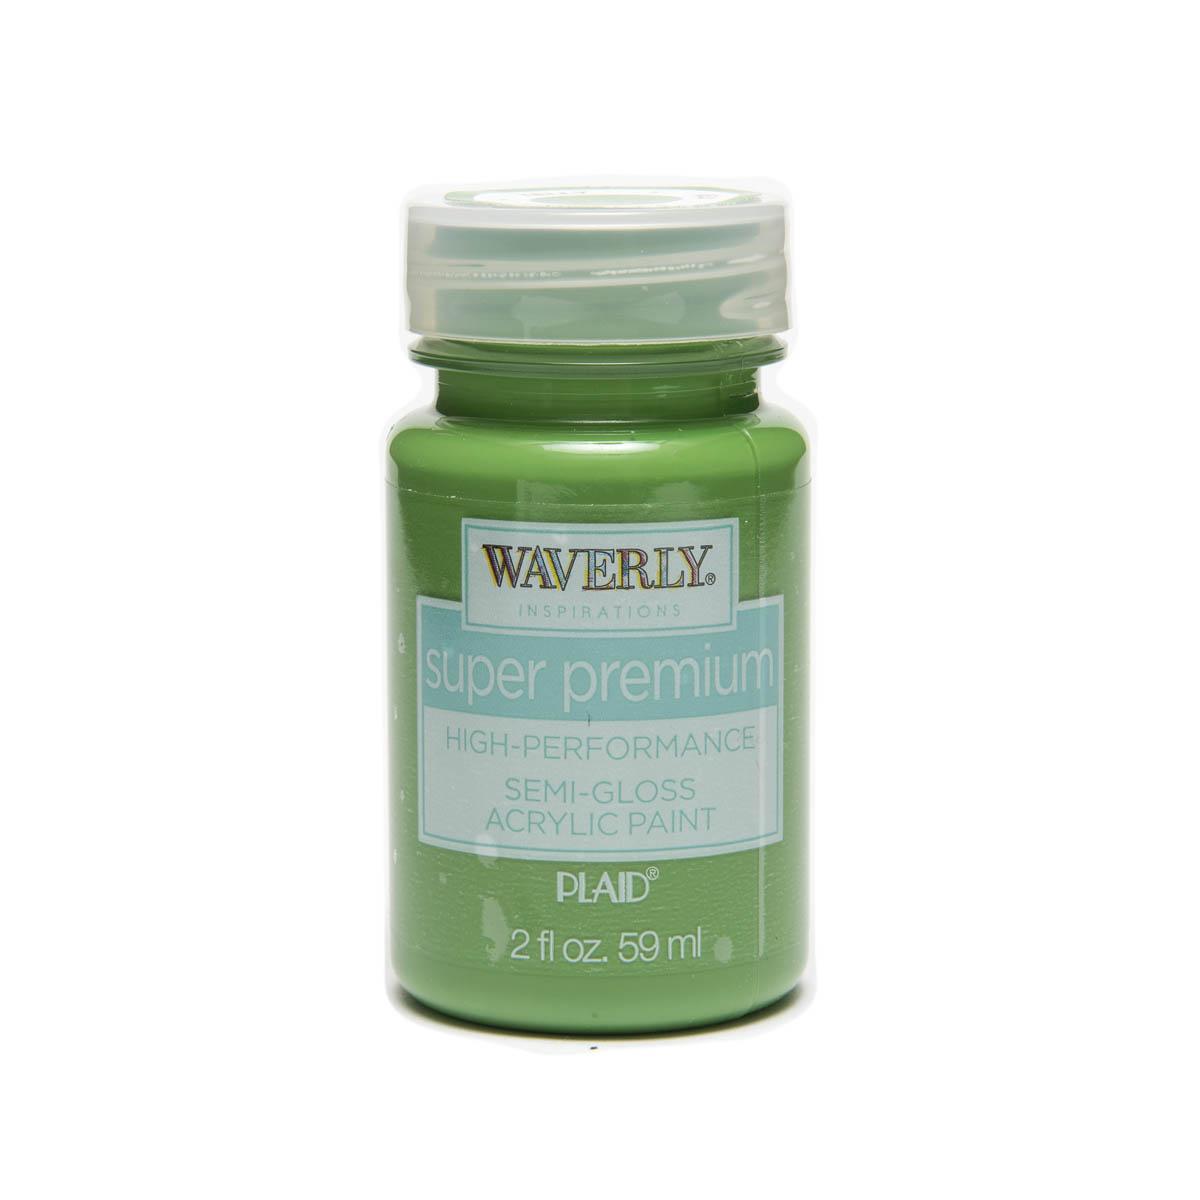 Waverly ® Inspirations Super Premium Semi-Gloss Acrylic Paint - Kelly, 2 oz.